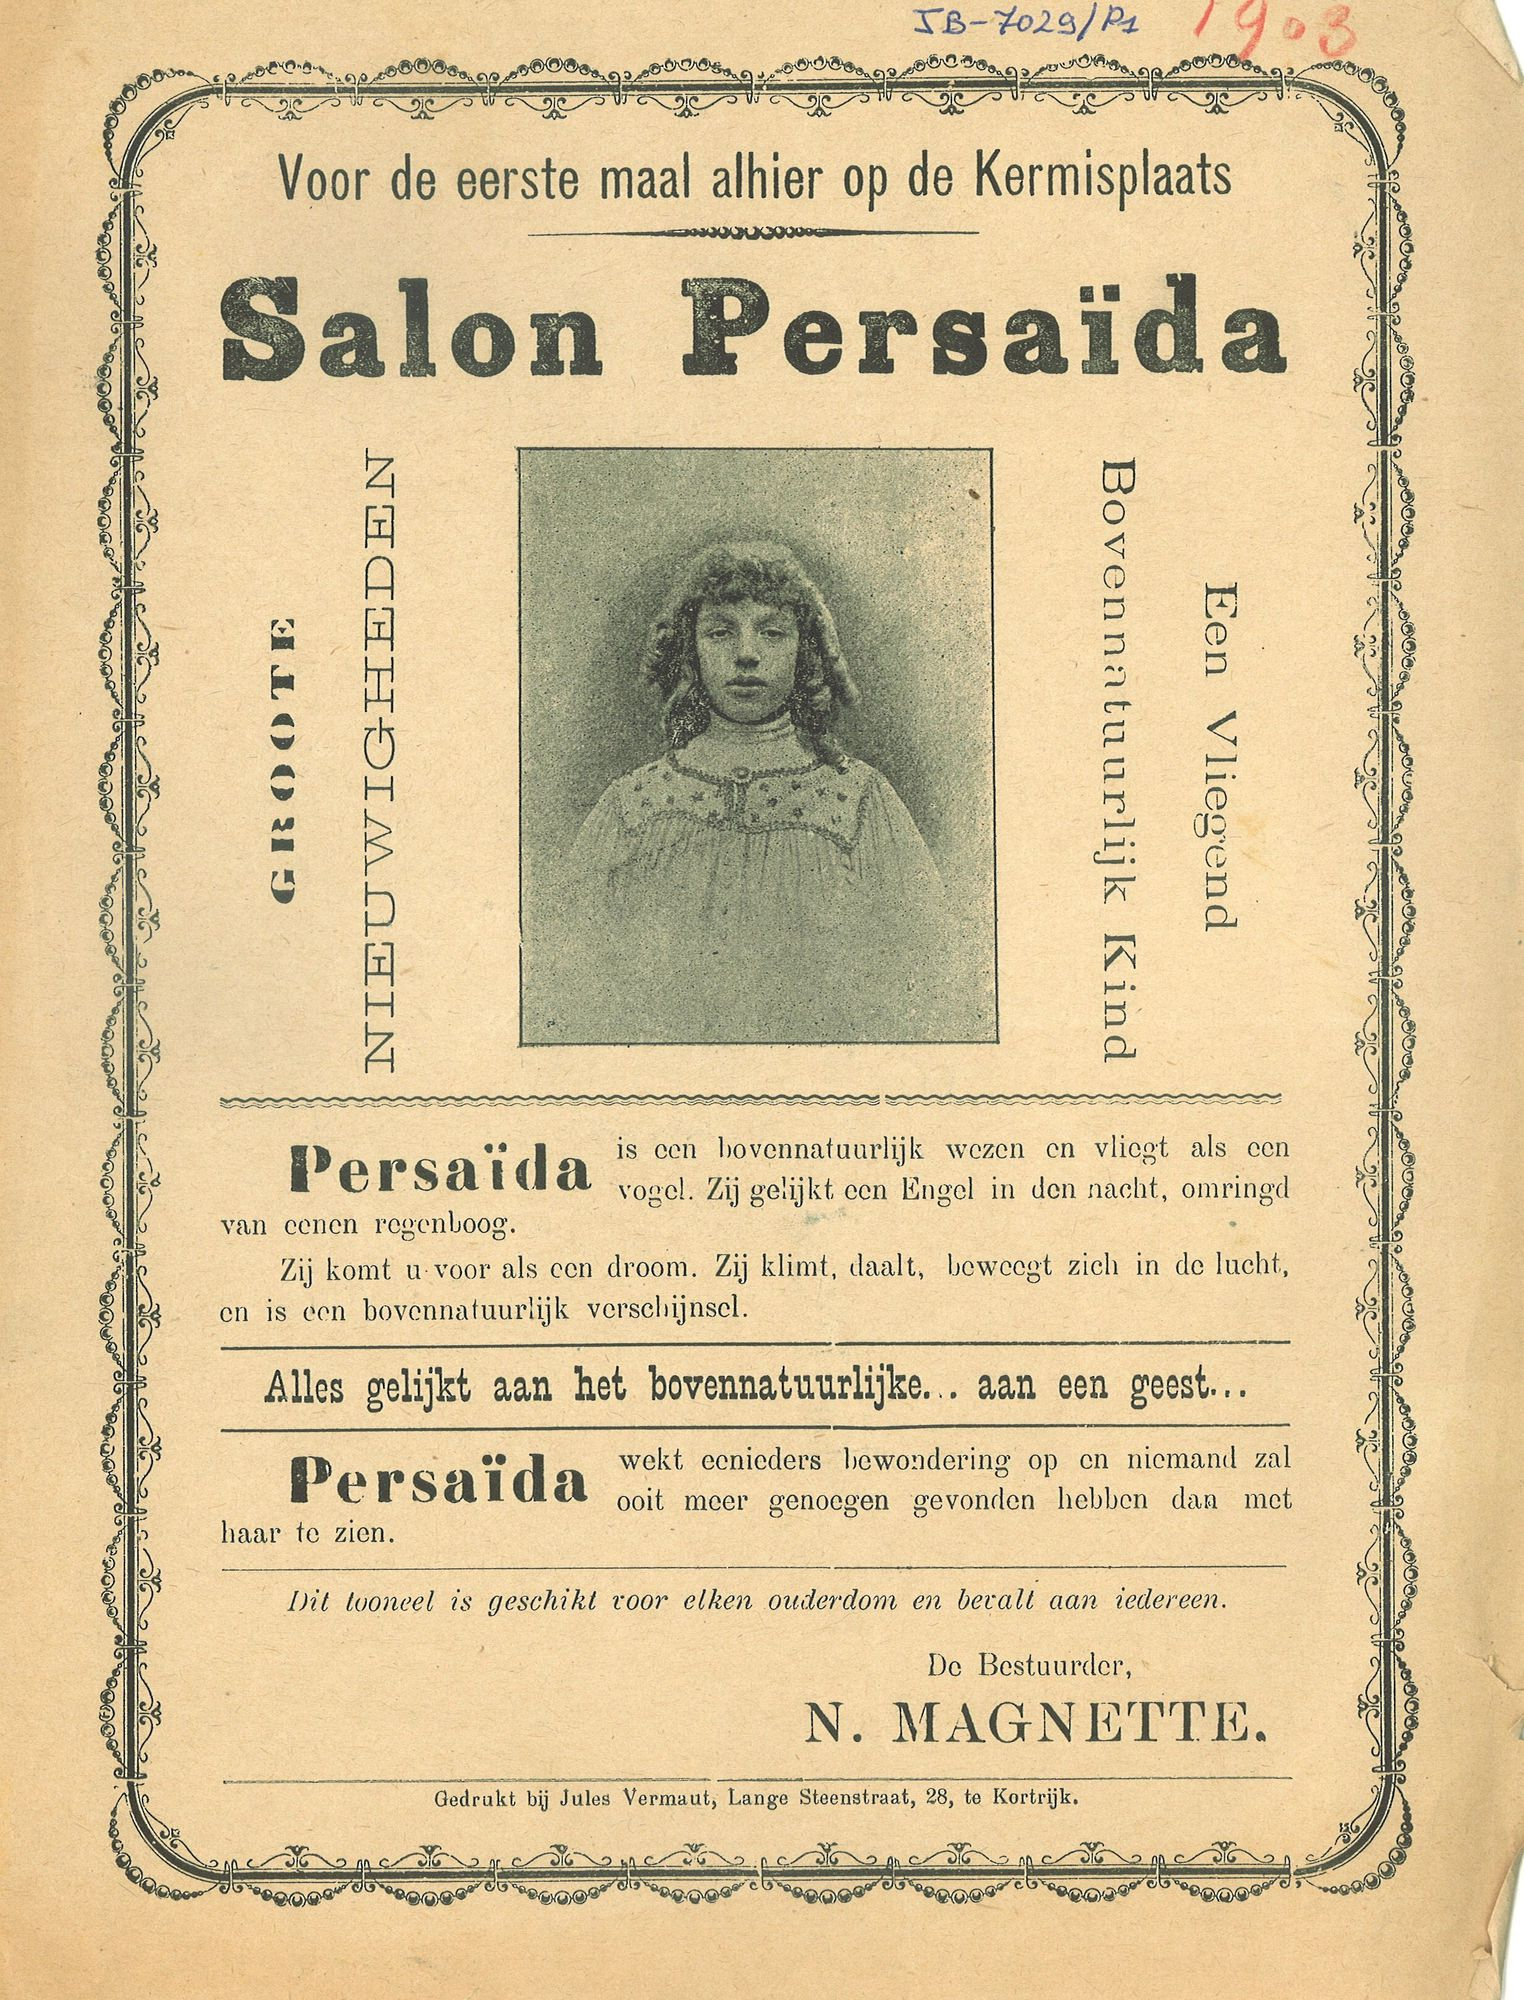 Paasfoor 1903: Salon Persaïda